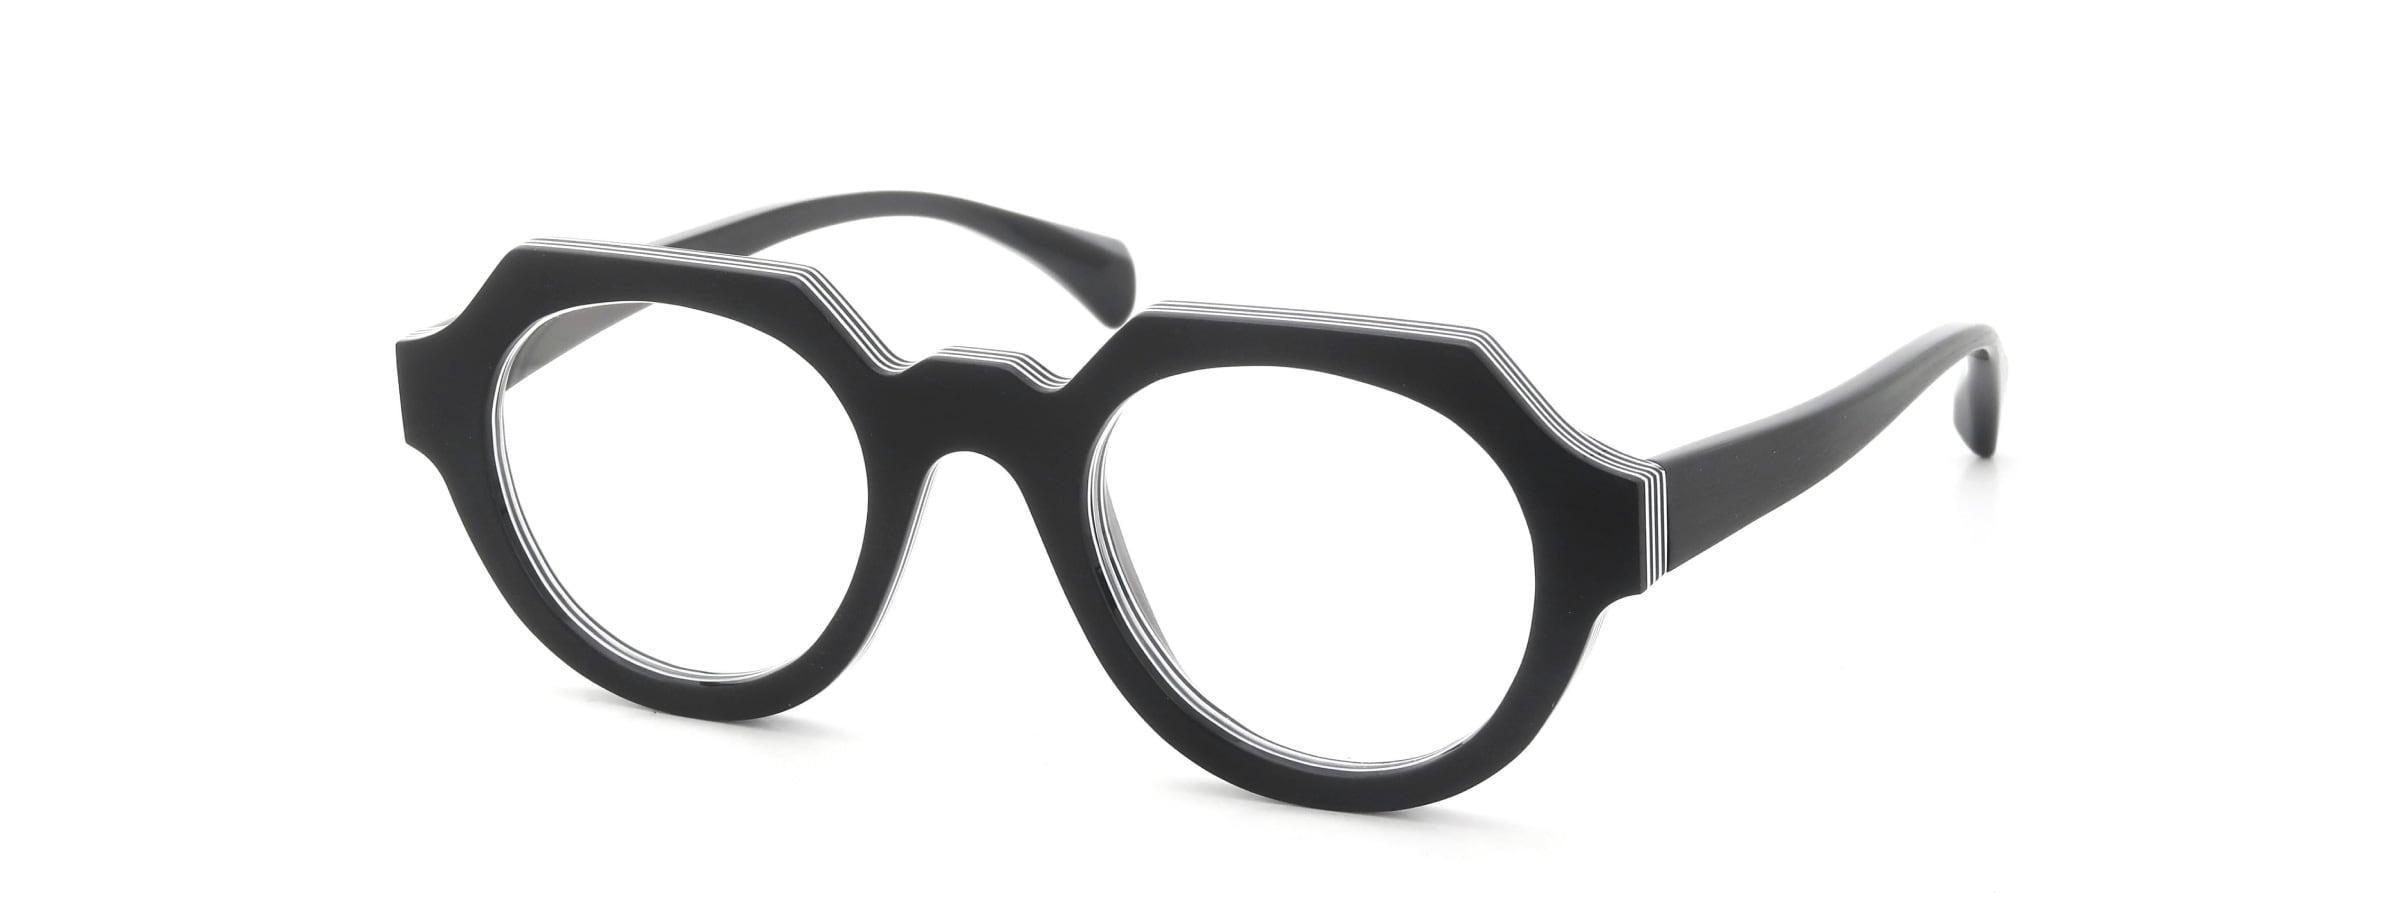 Jacques durand PRASLIN 248 col.142 HM-BLACK/Black and white layer全体像